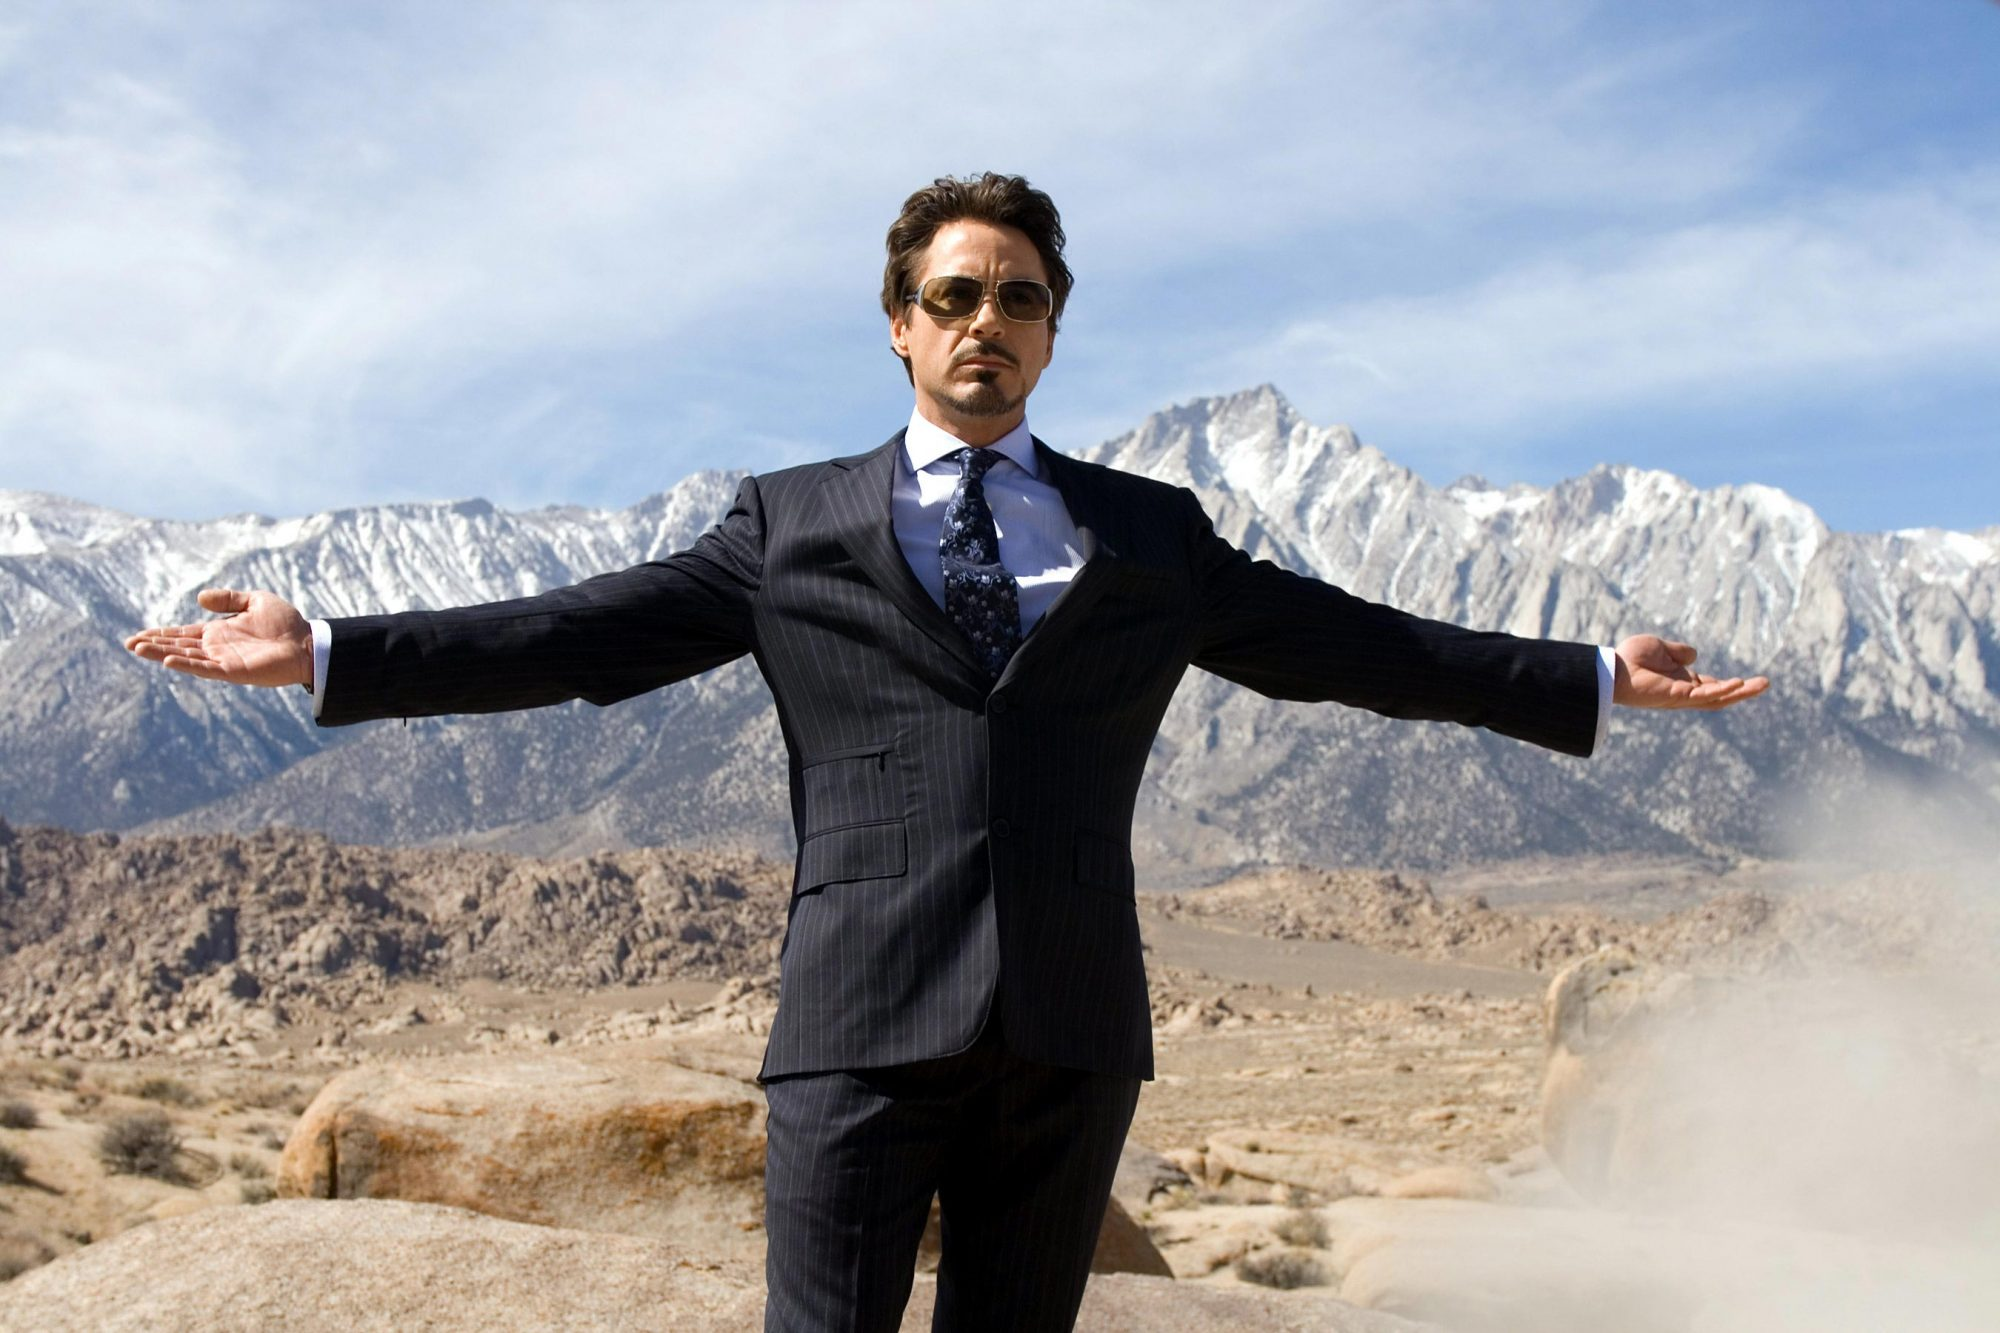 IRON MAN, Robert Downey Jr., 2008. ©Paramount/Courtesy Everett Collection